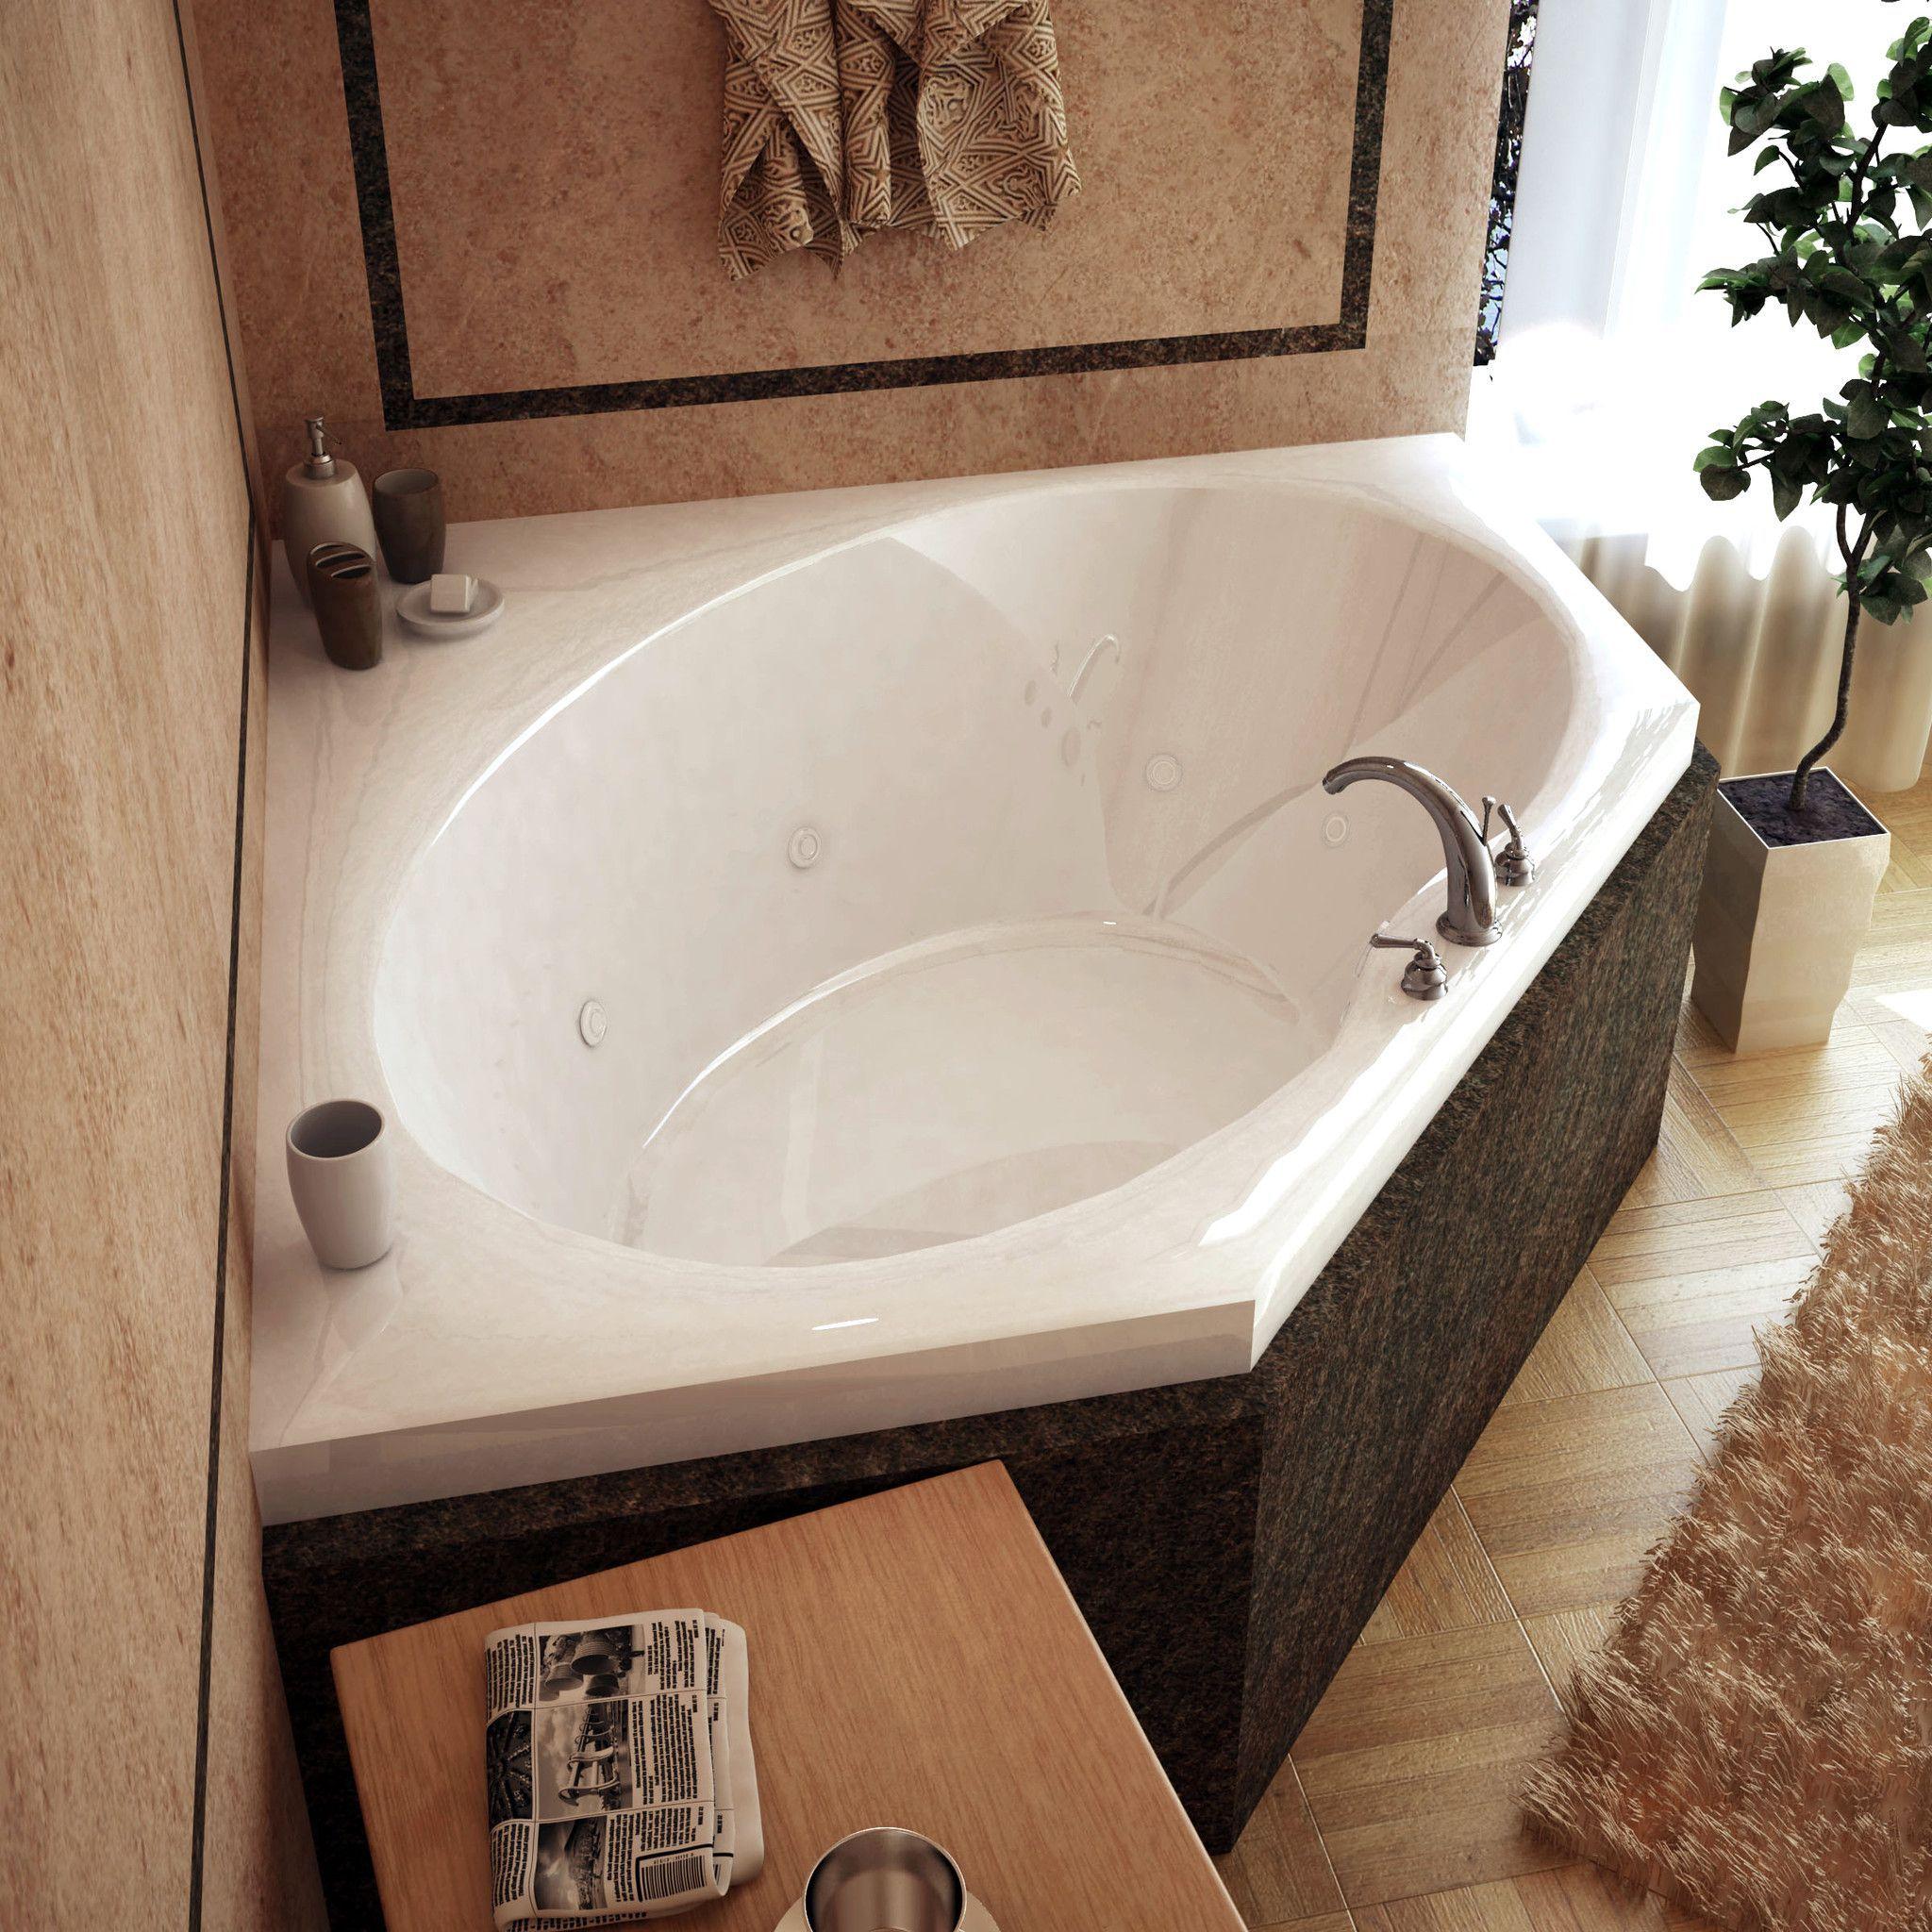 Venzi VZ6060VWR Stella 60 x 60 Corner Whirlpool Jetted Bathtub with ...